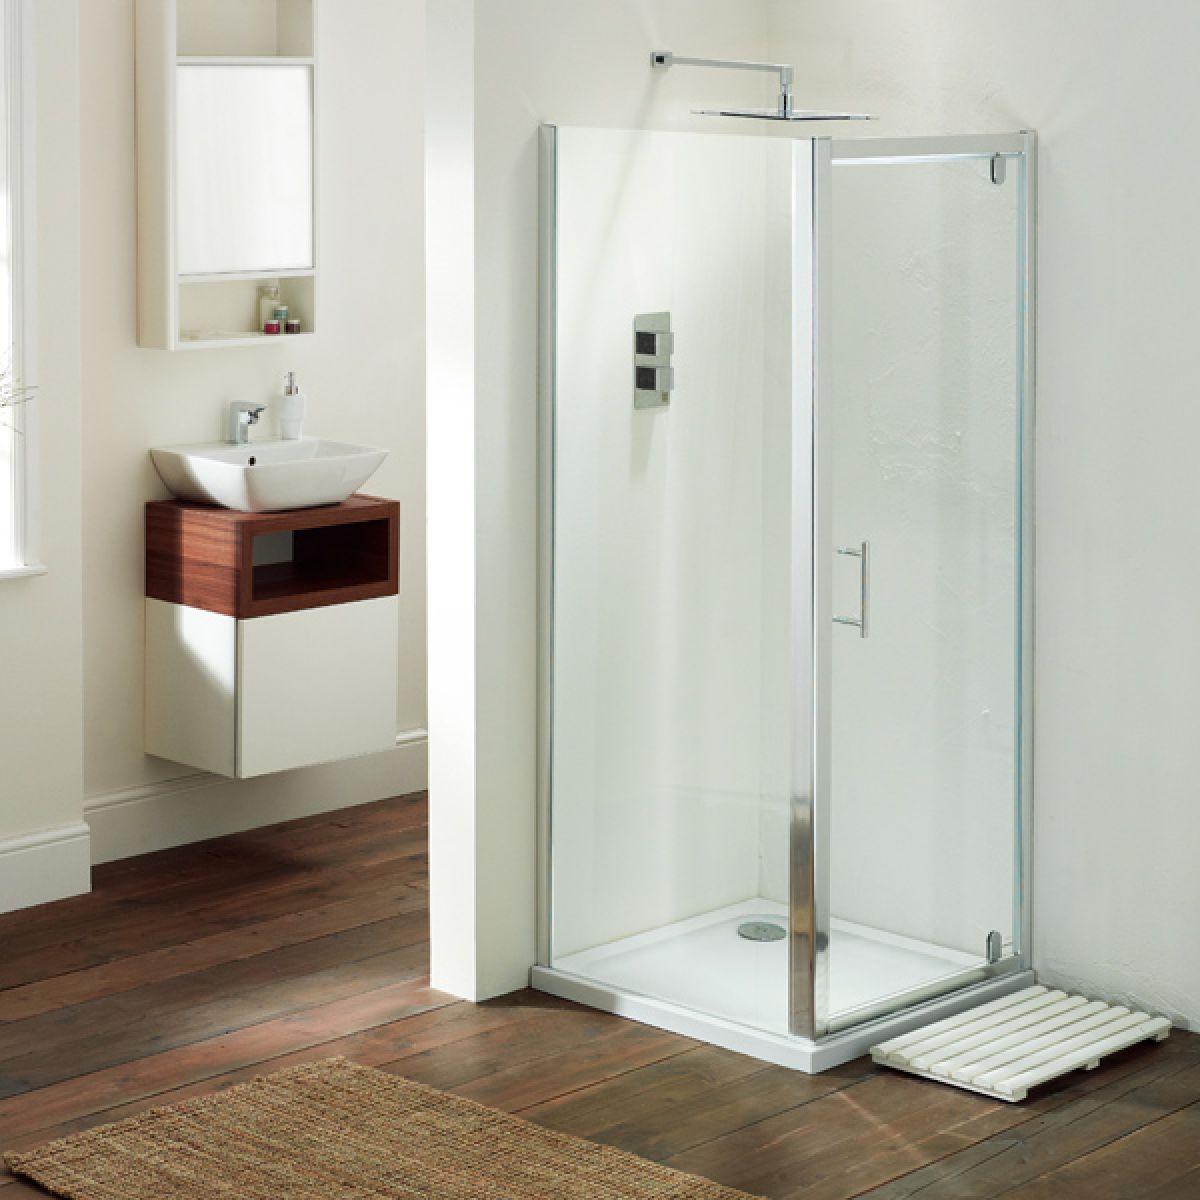 Frontline Aquaglass Purity Pivot Shower Door with Optional Side Panel